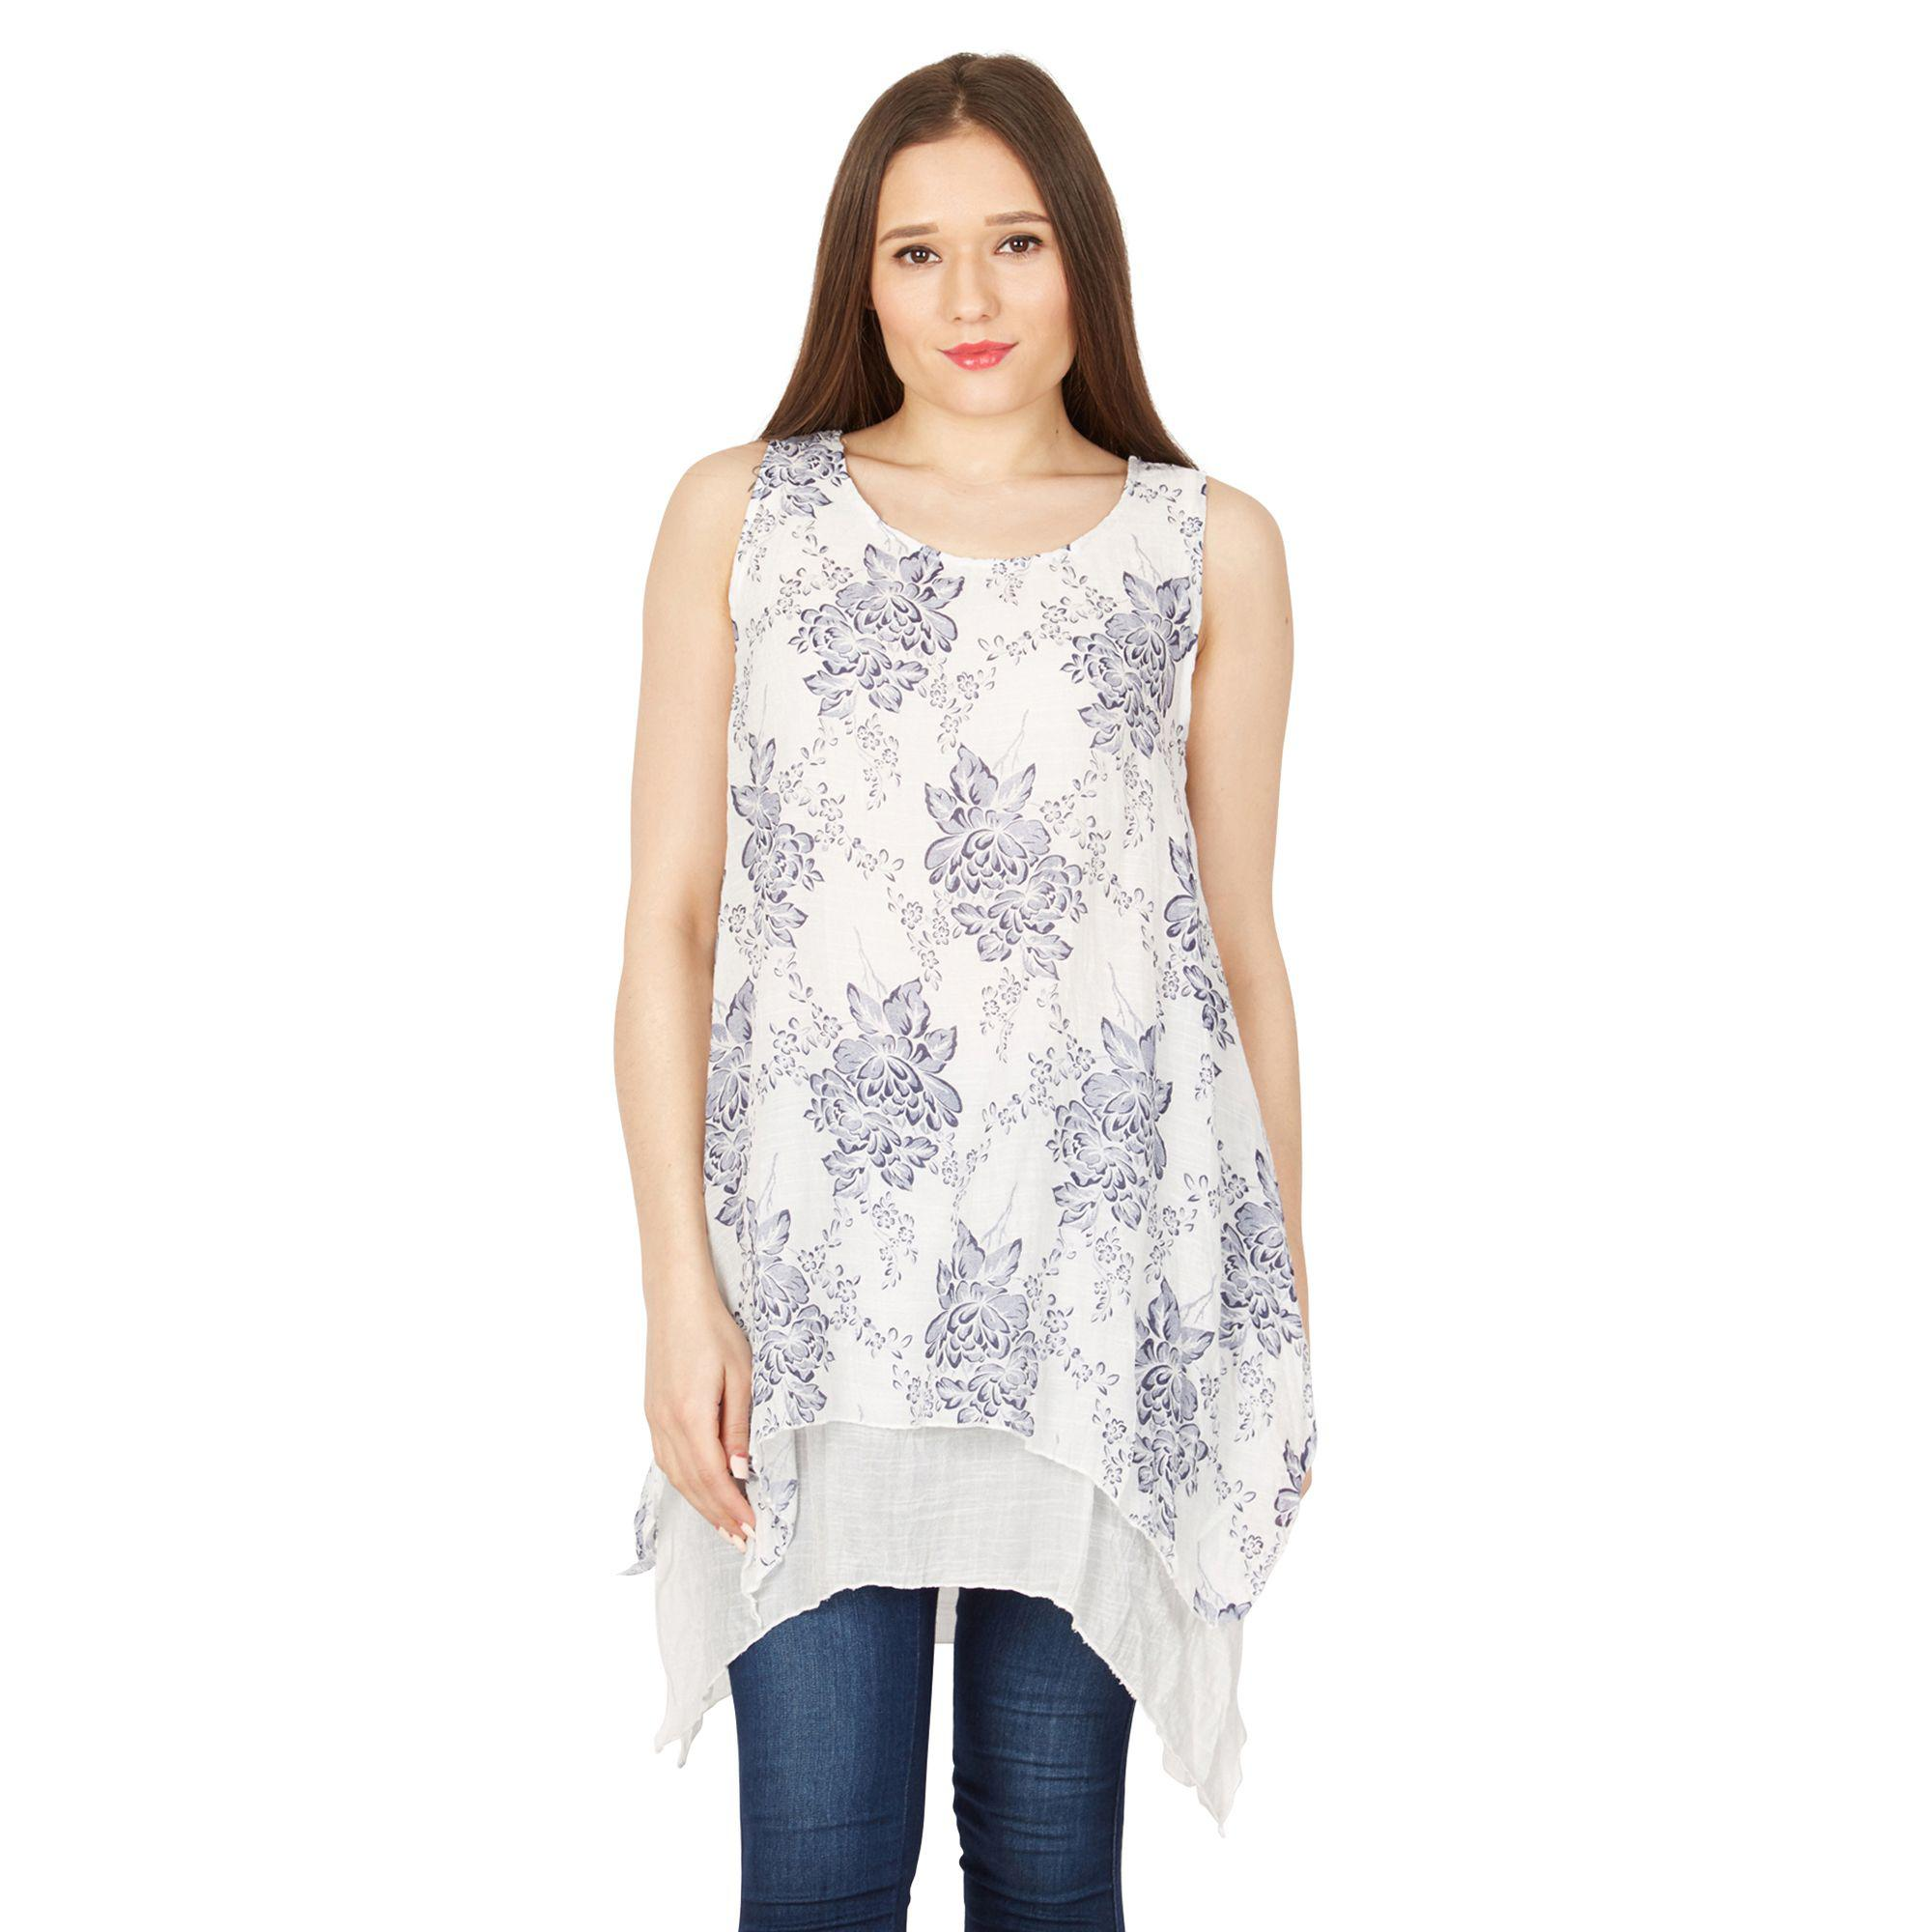 8ea6d6afccd Izabel London Multicoloured Foliage Dual Layer Tunic in White - Lyst